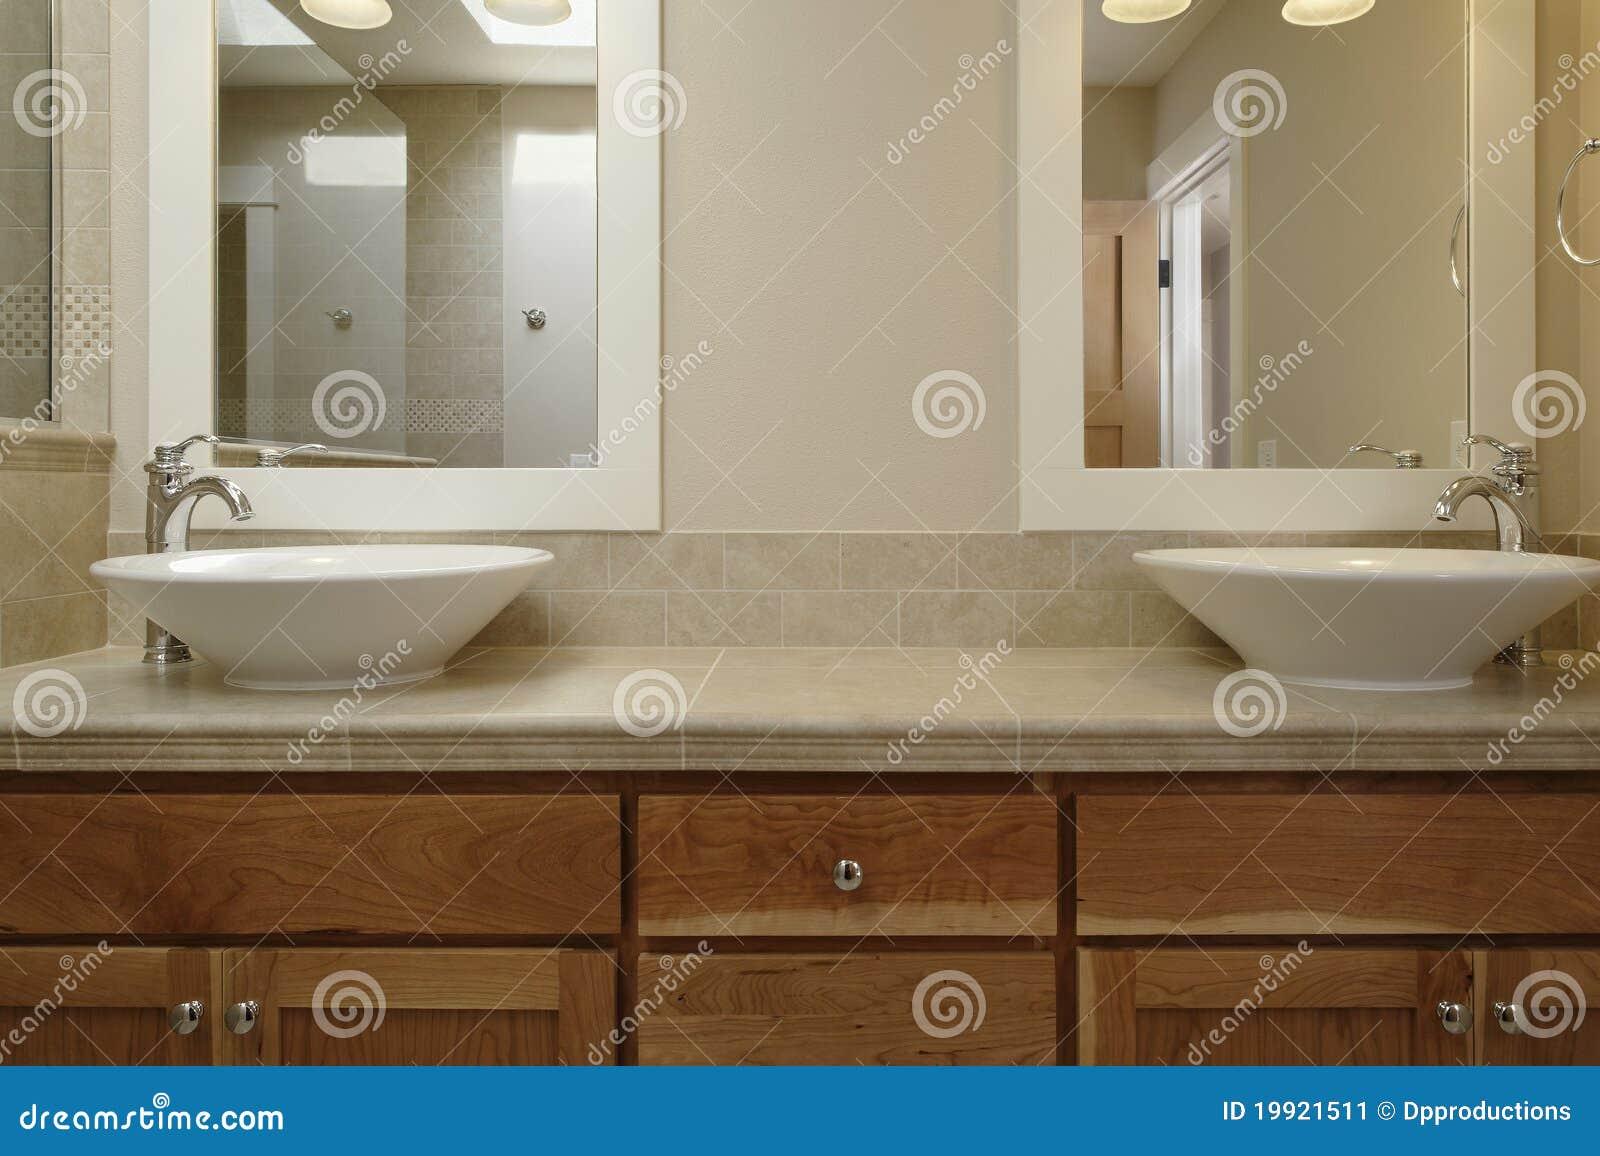 Dual Vessel Sink Vanity Stock Image Image Of Interior 19921511